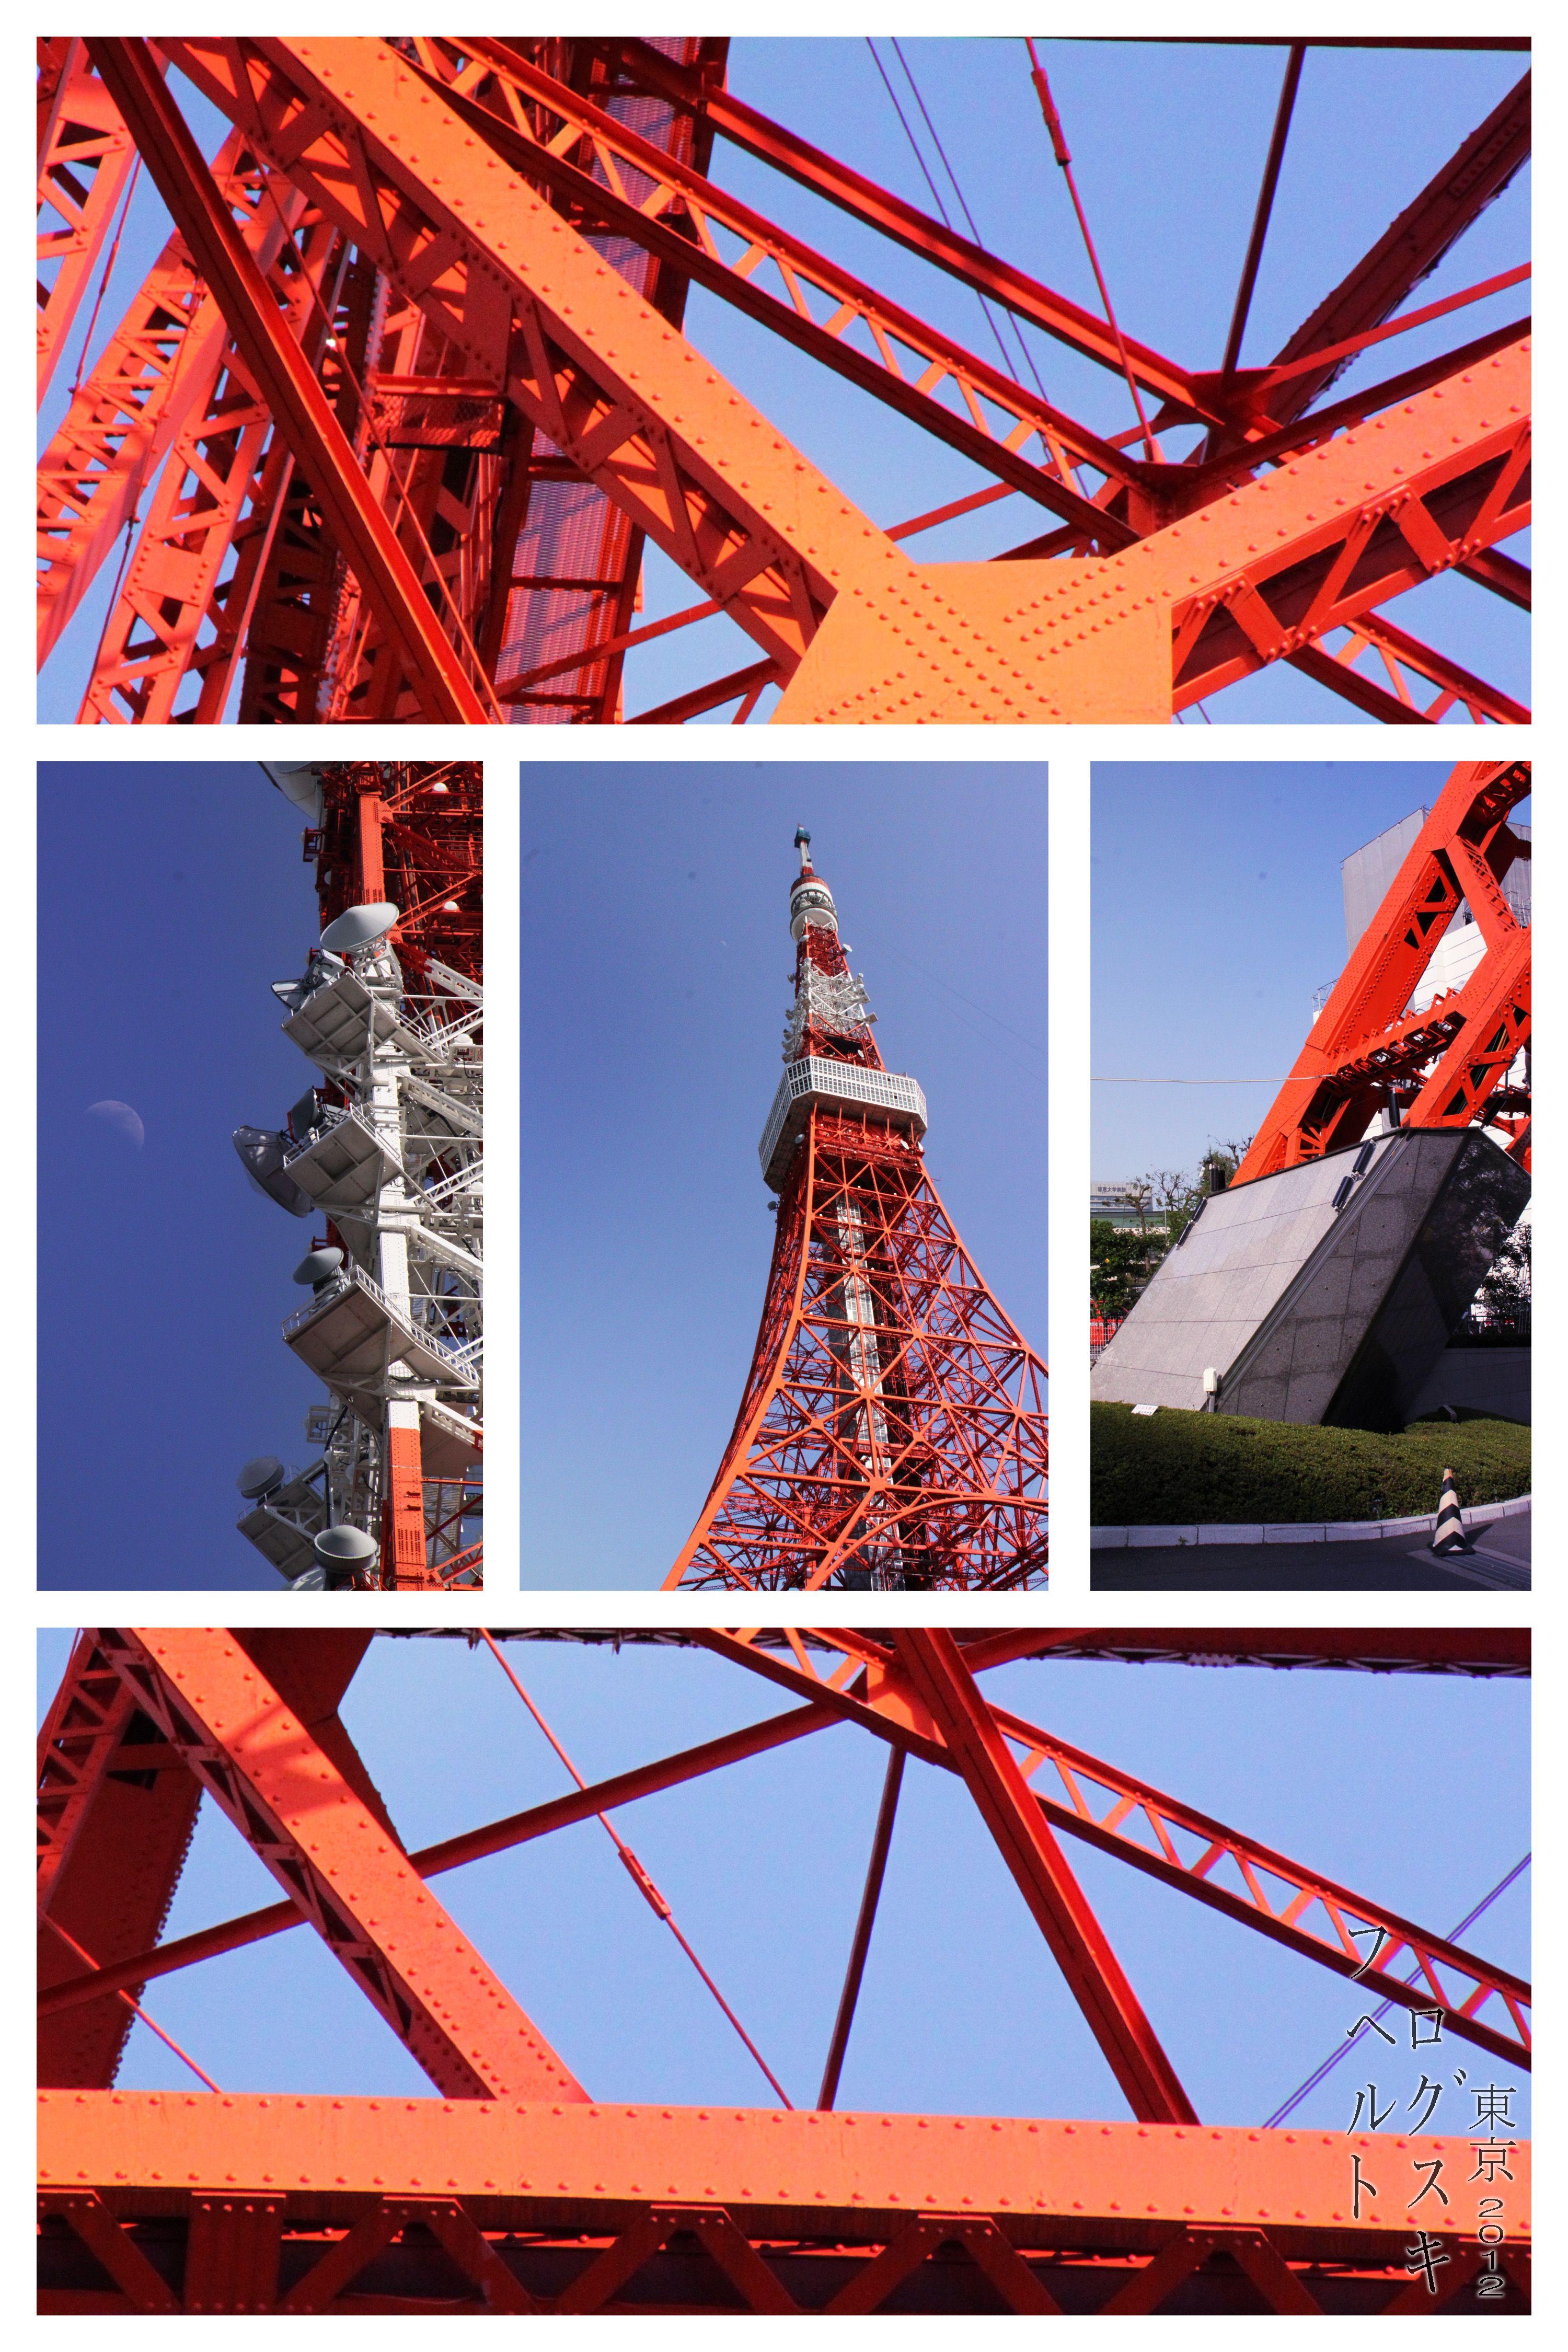 Tokyo Tower Minato, Tokyo 1958 Tachū Naitō JapArch, photo by Hubert Roguski